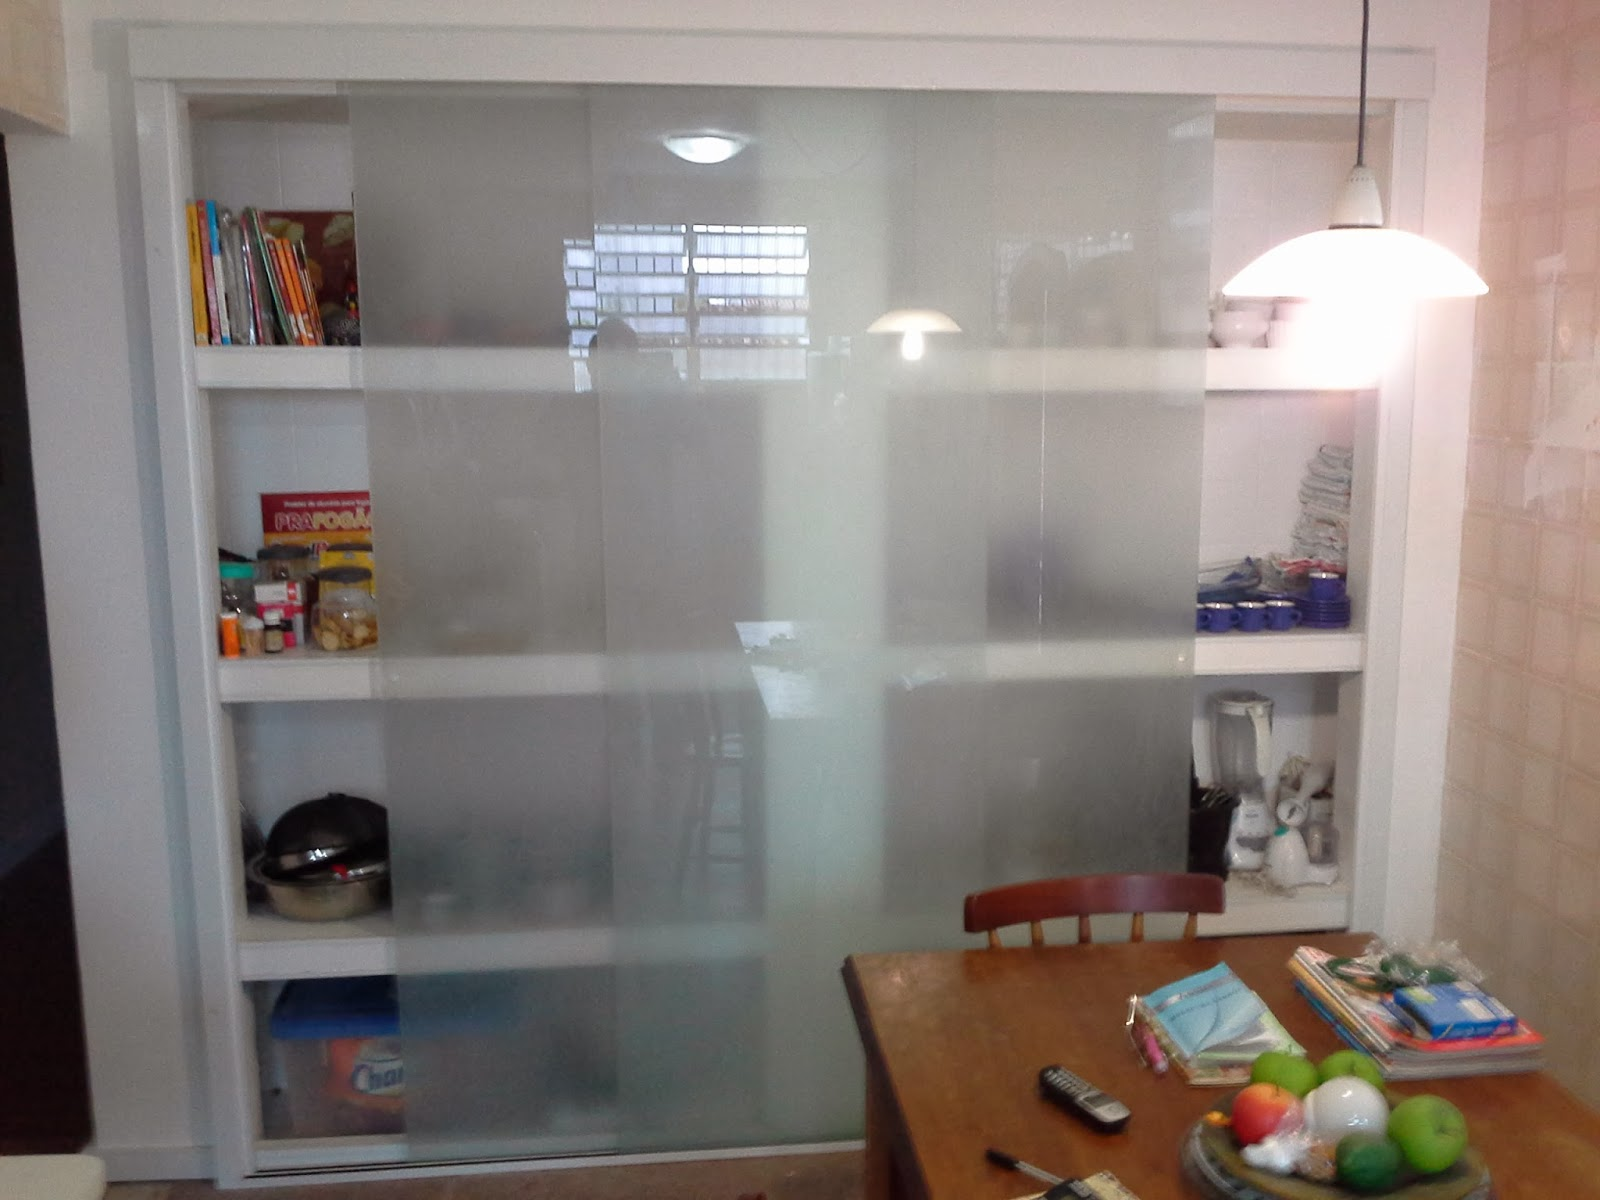 AF4 TEMPER VIDROS: Armario de cozinha vidro jateado sistema versatik #67402A 1600 1200